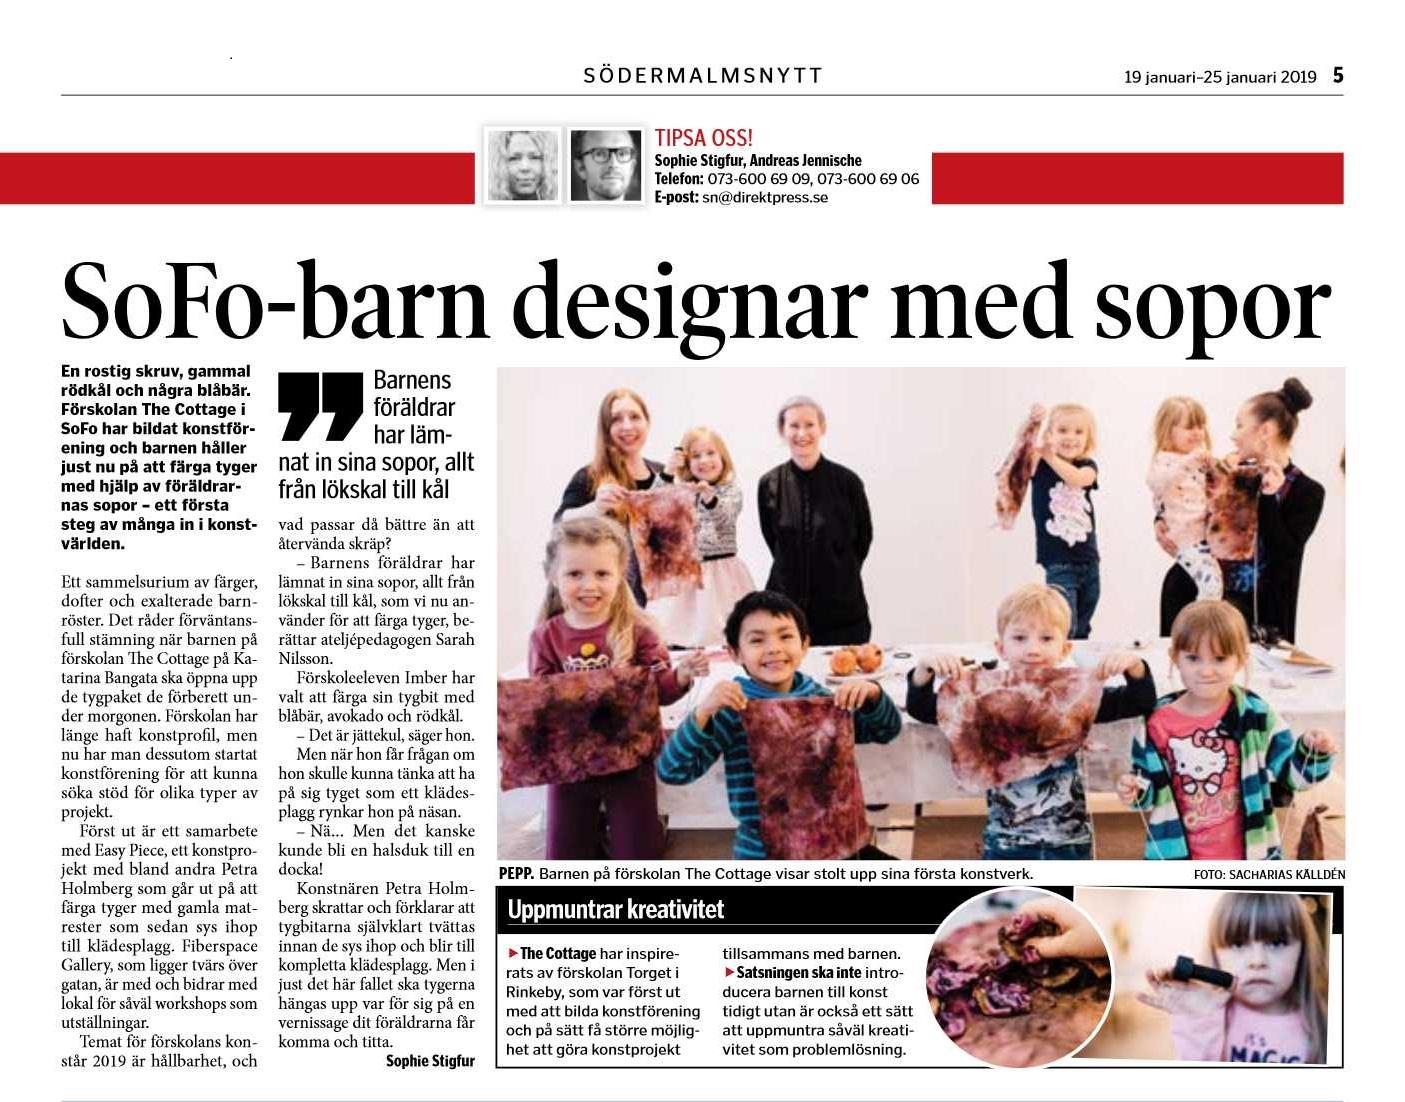 Södermalmsnytt 18 jan 2019 - artikel Easy Piece The Cottage Fiberspace slow creations.jpg